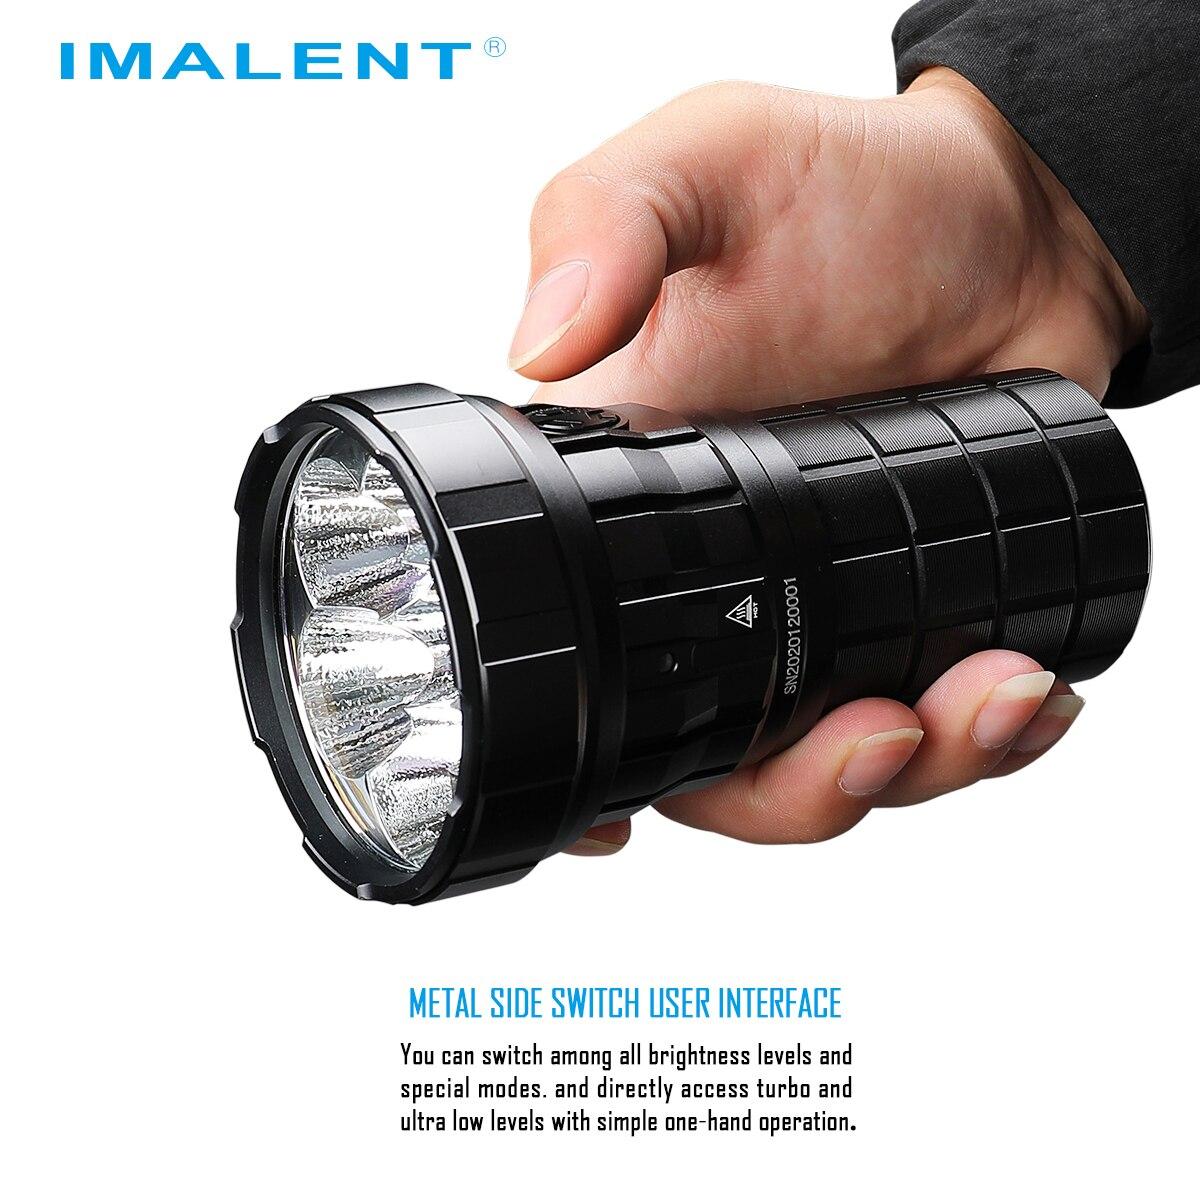 IMALENT R60C Flashlight Super Powerful Light Torch LED Lantern 18000LM 1038m 5 Level 21700-4000mAH IPX-8 Waterproof Rechargeable enlarge